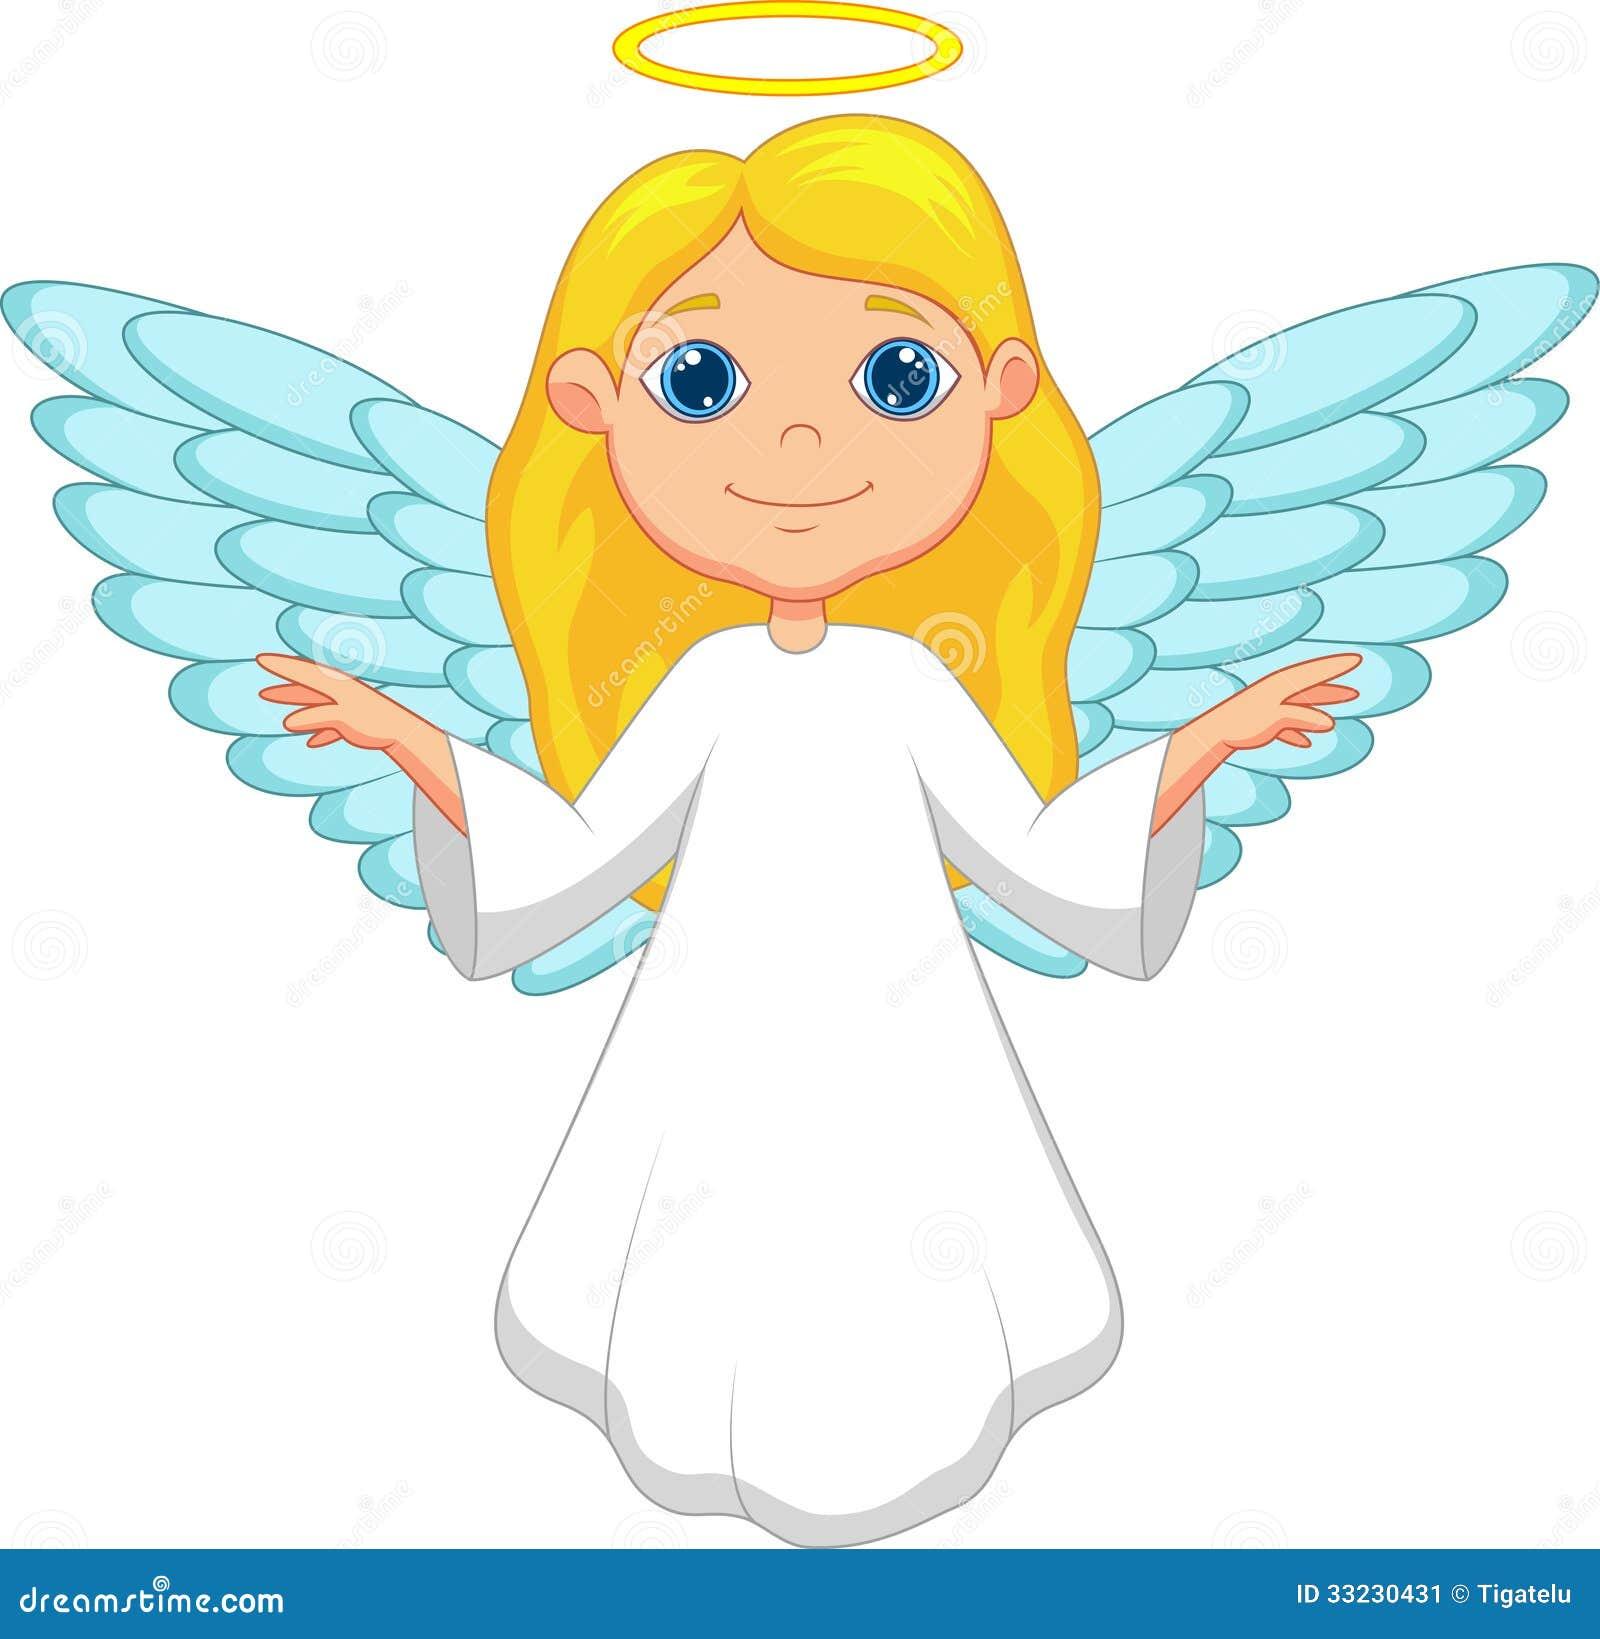 cartoon angel clipart - photo #28